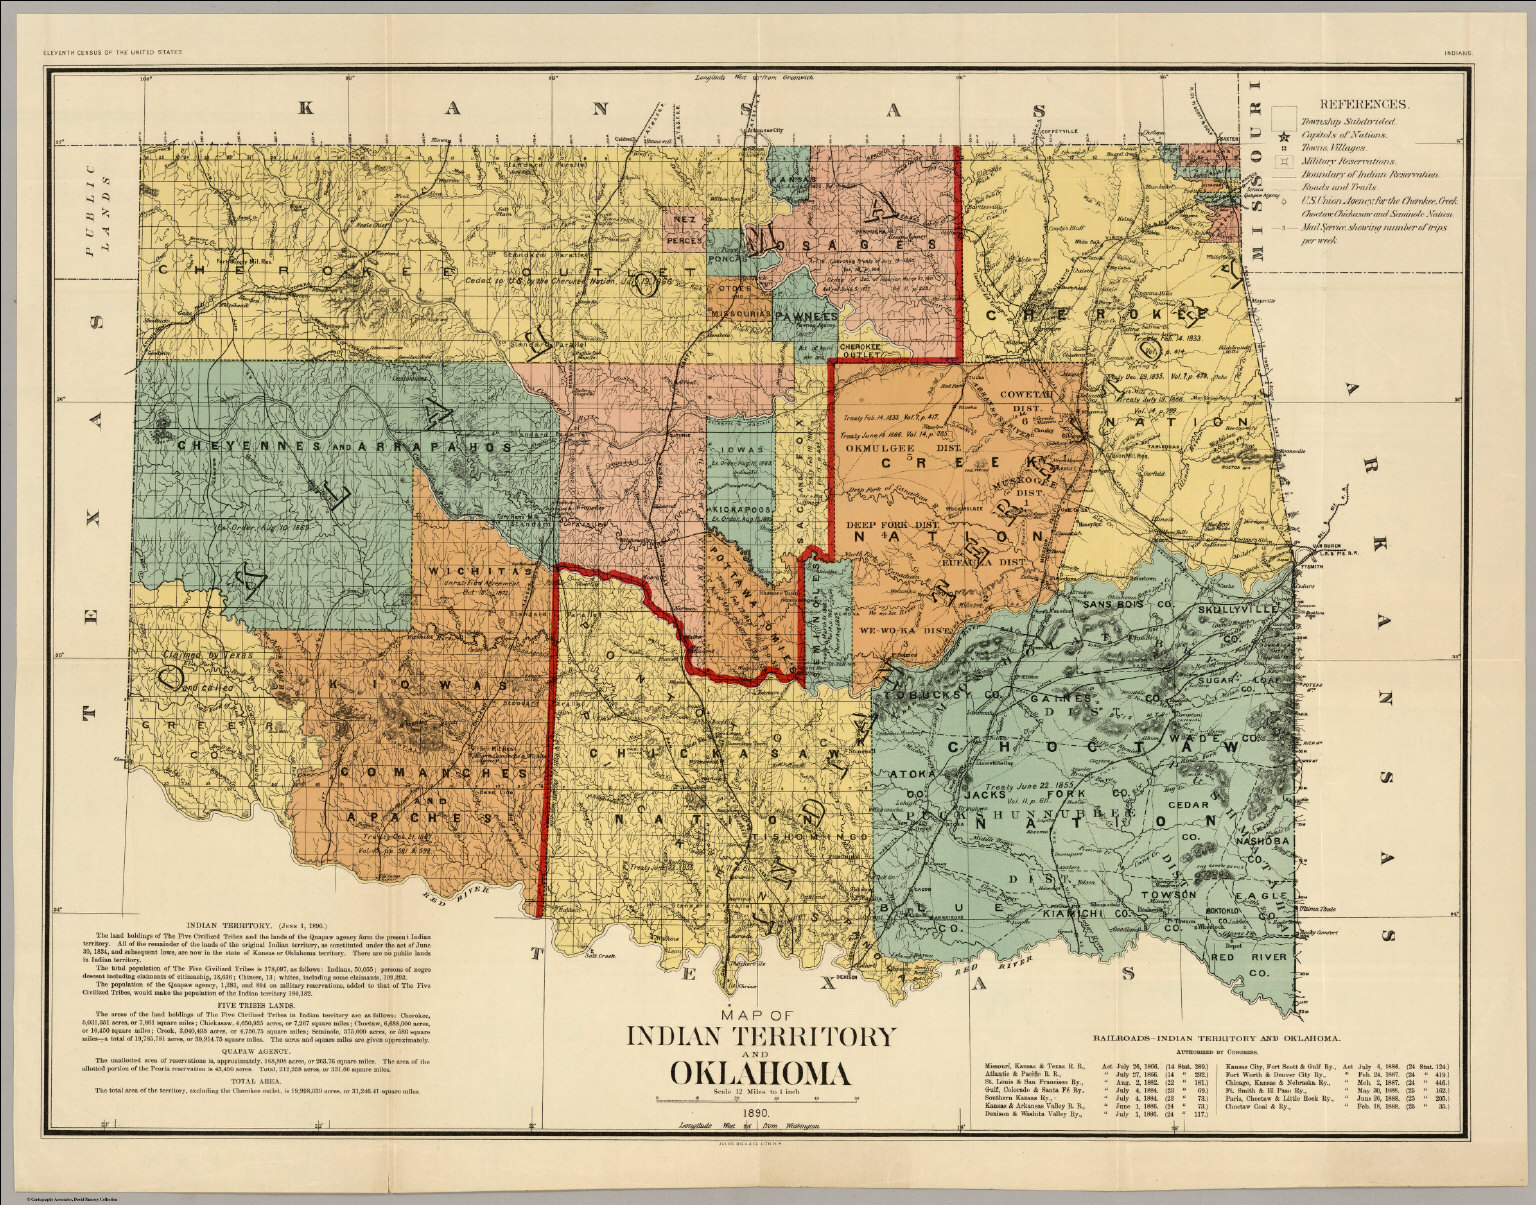 oklahoma indian territory1890